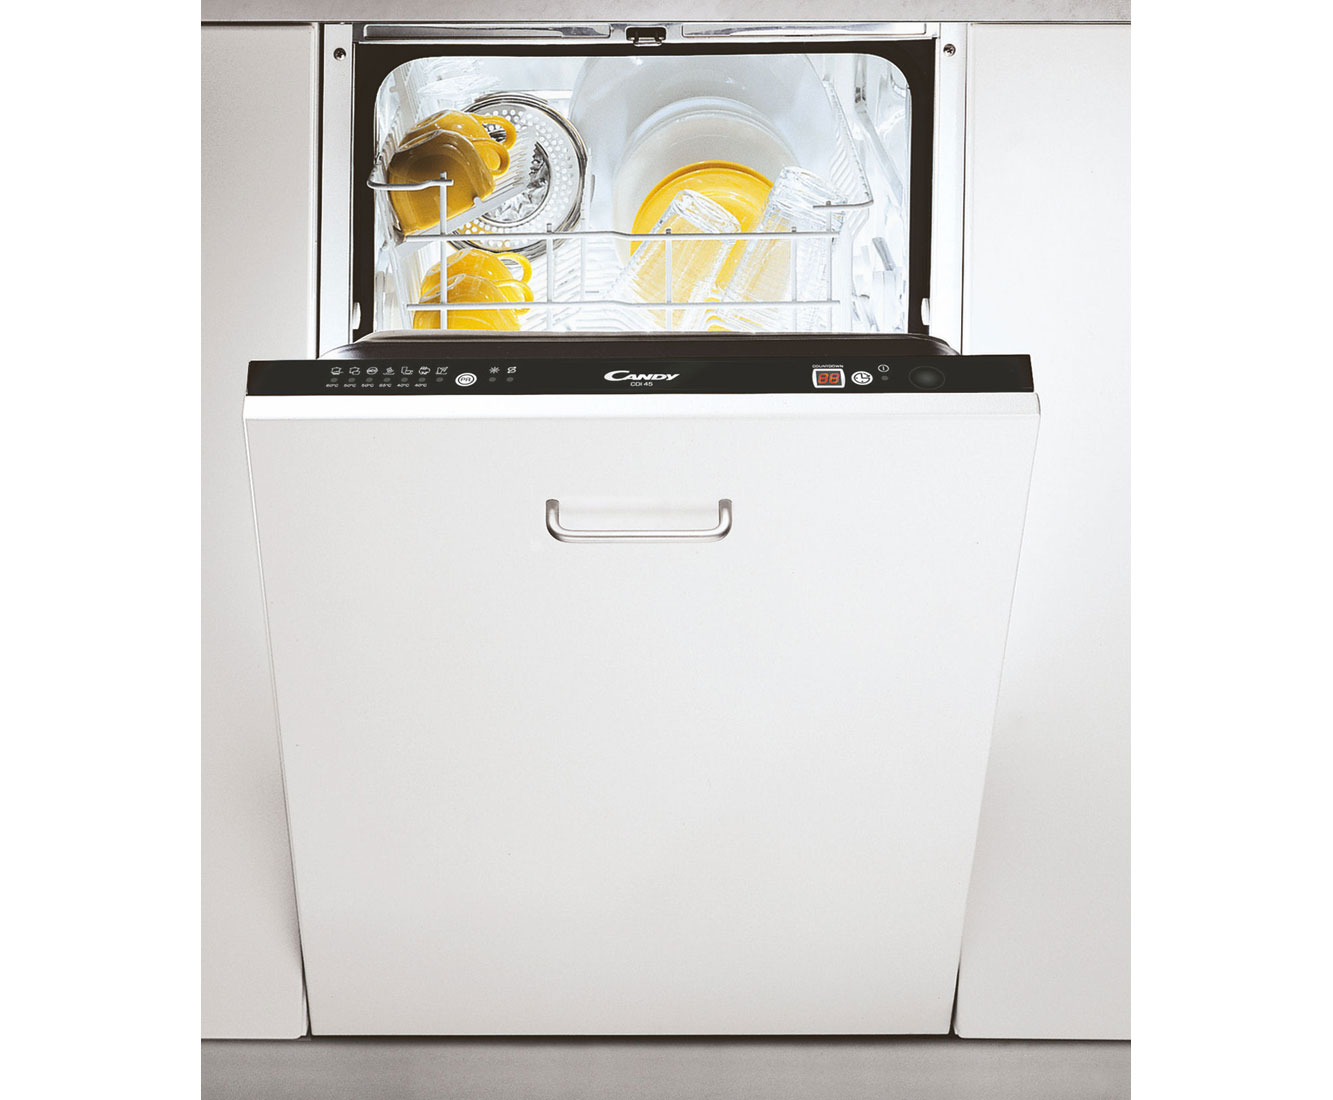 Slimline Kitchen Appliances Candy Cdi4545 E Fully Integrated Slimline Dishwasher Black